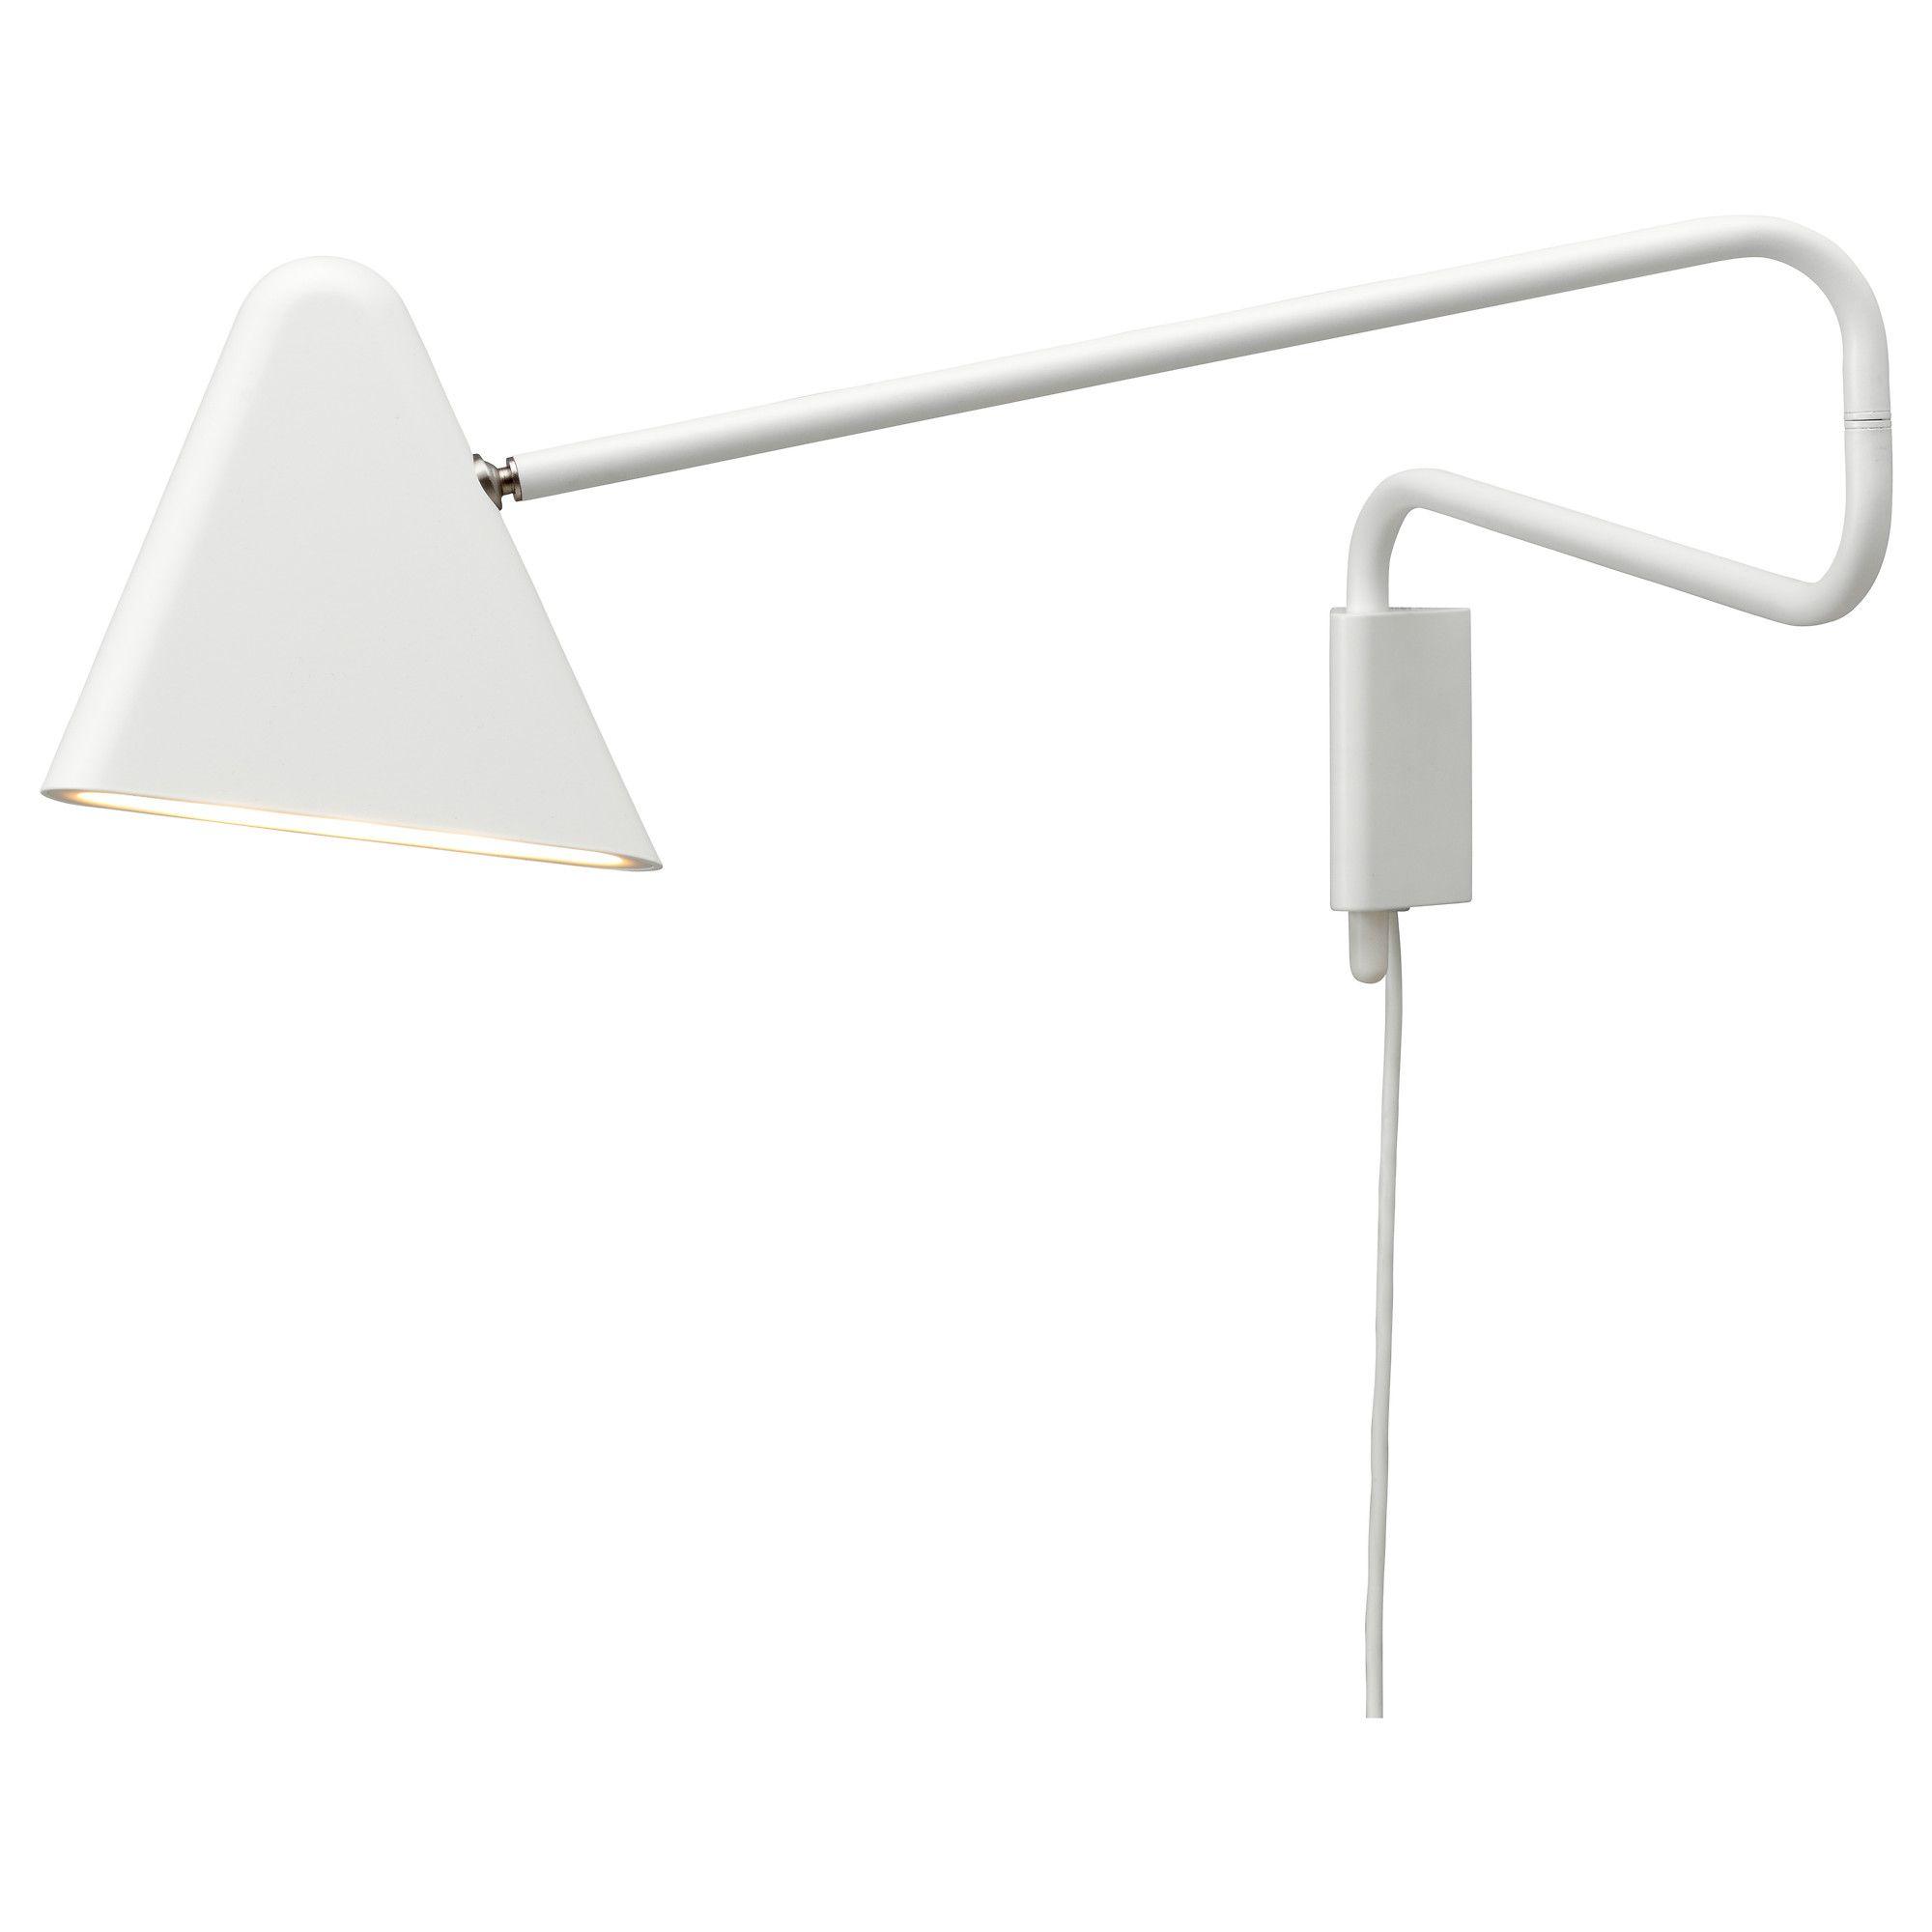 ikea ps 2012 led wall lamp white ikea chicago. Black Bedroom Furniture Sets. Home Design Ideas